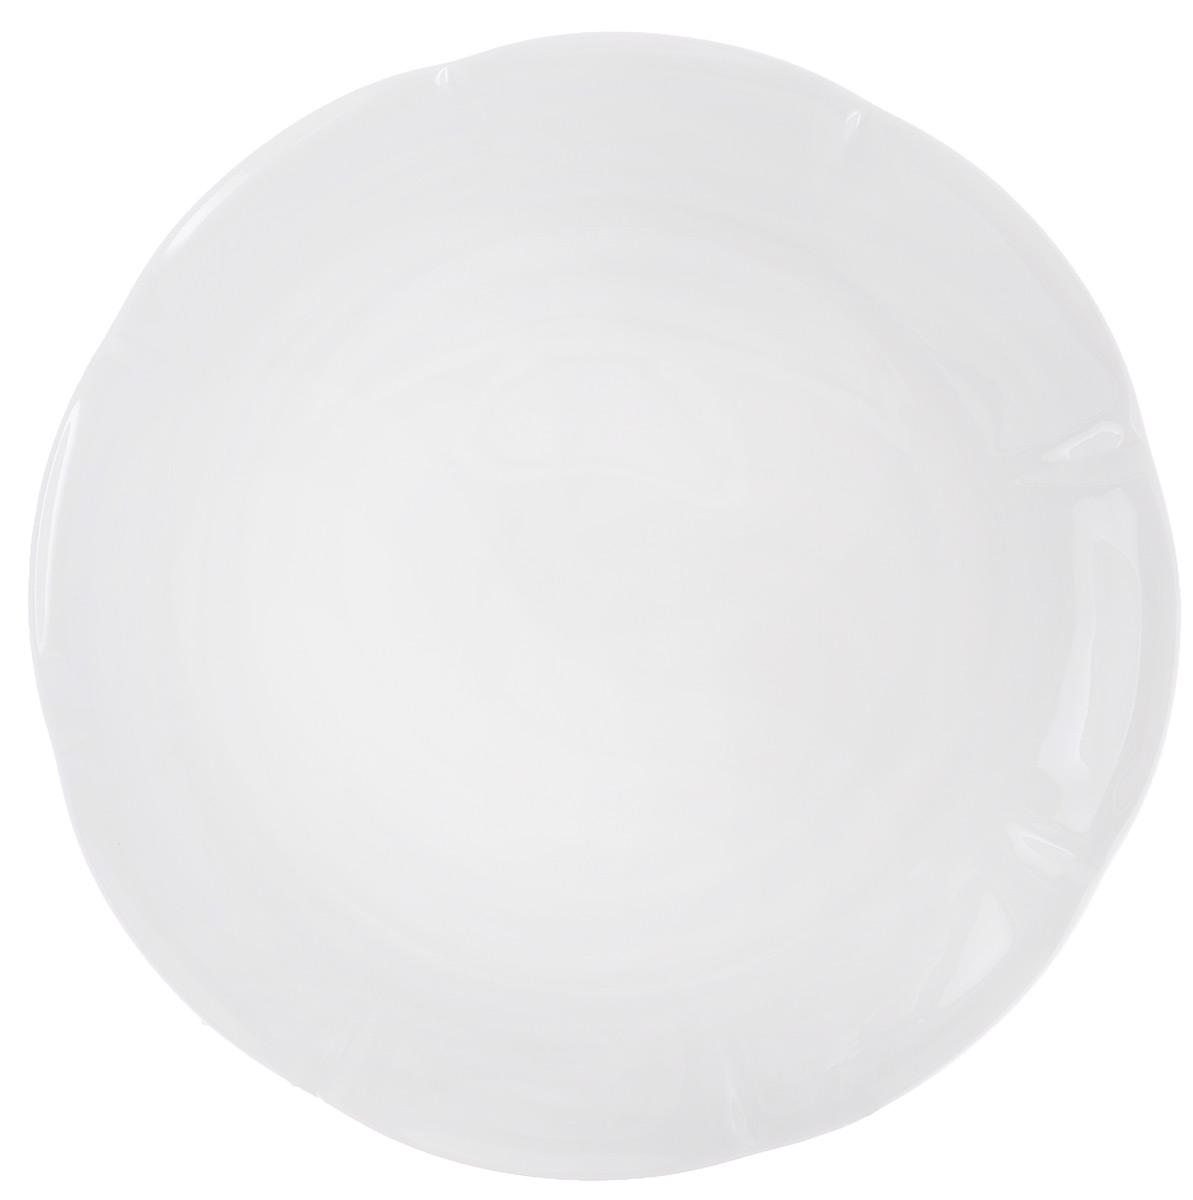 Блюдо для торта Royal Bone China White, диаметр 33 см